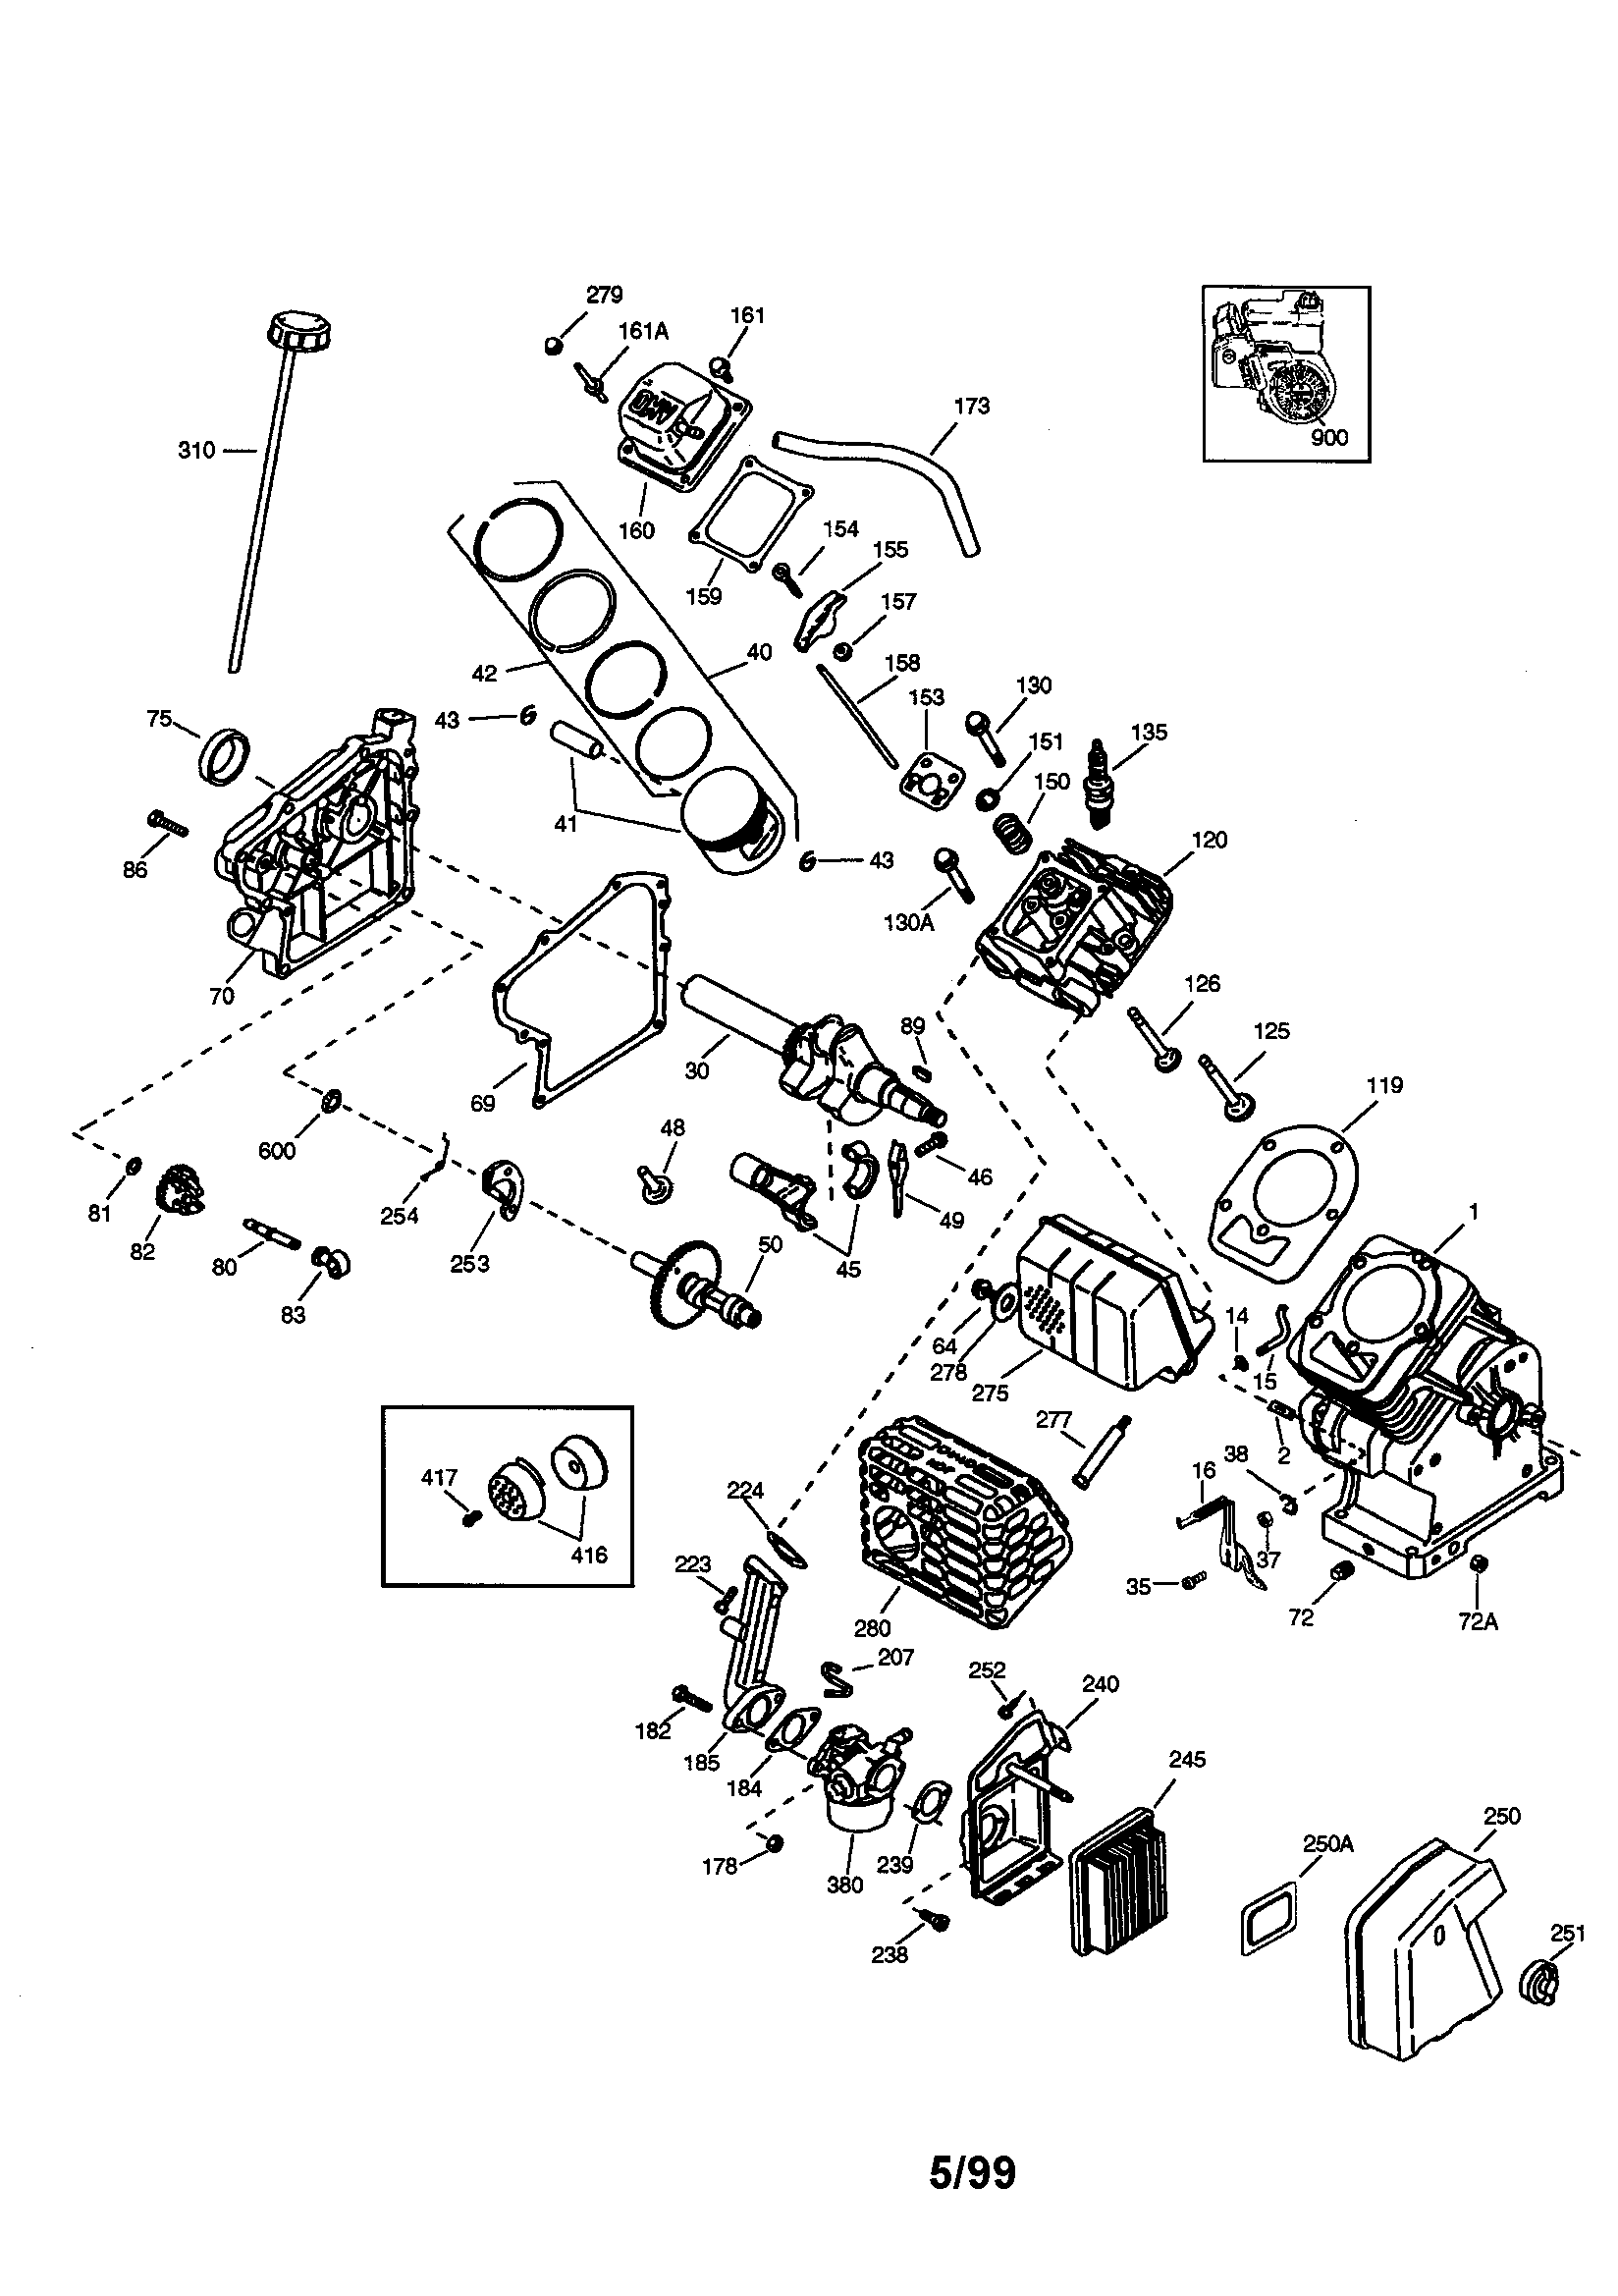 rebuild tecumseh carburetor diagram ford wiring diagrams f150 4 cycle engine parts model ohh6071131c sears